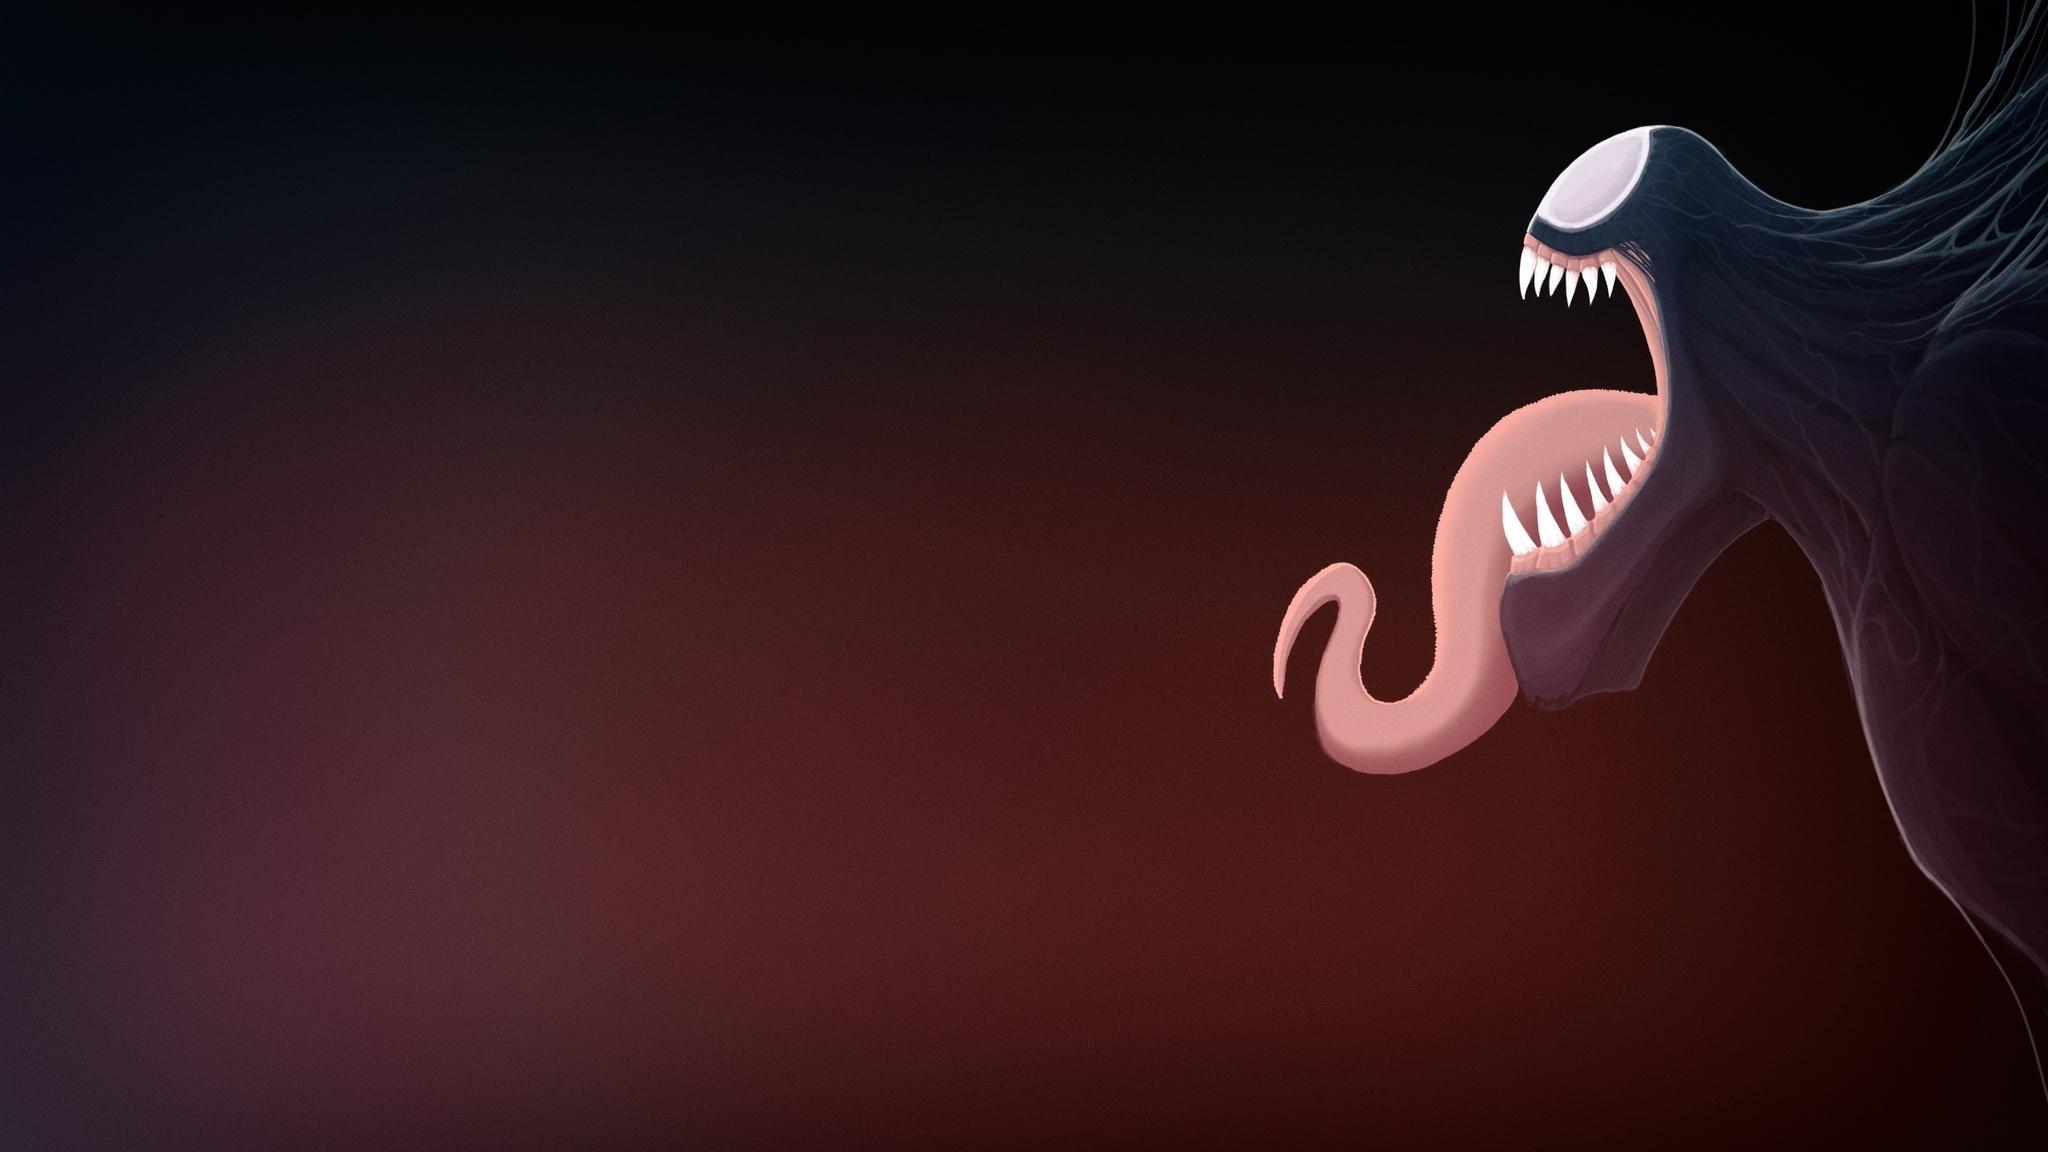 2048x1152 venom cool artwork 2048x1152 resolution hd 4k wallpapers